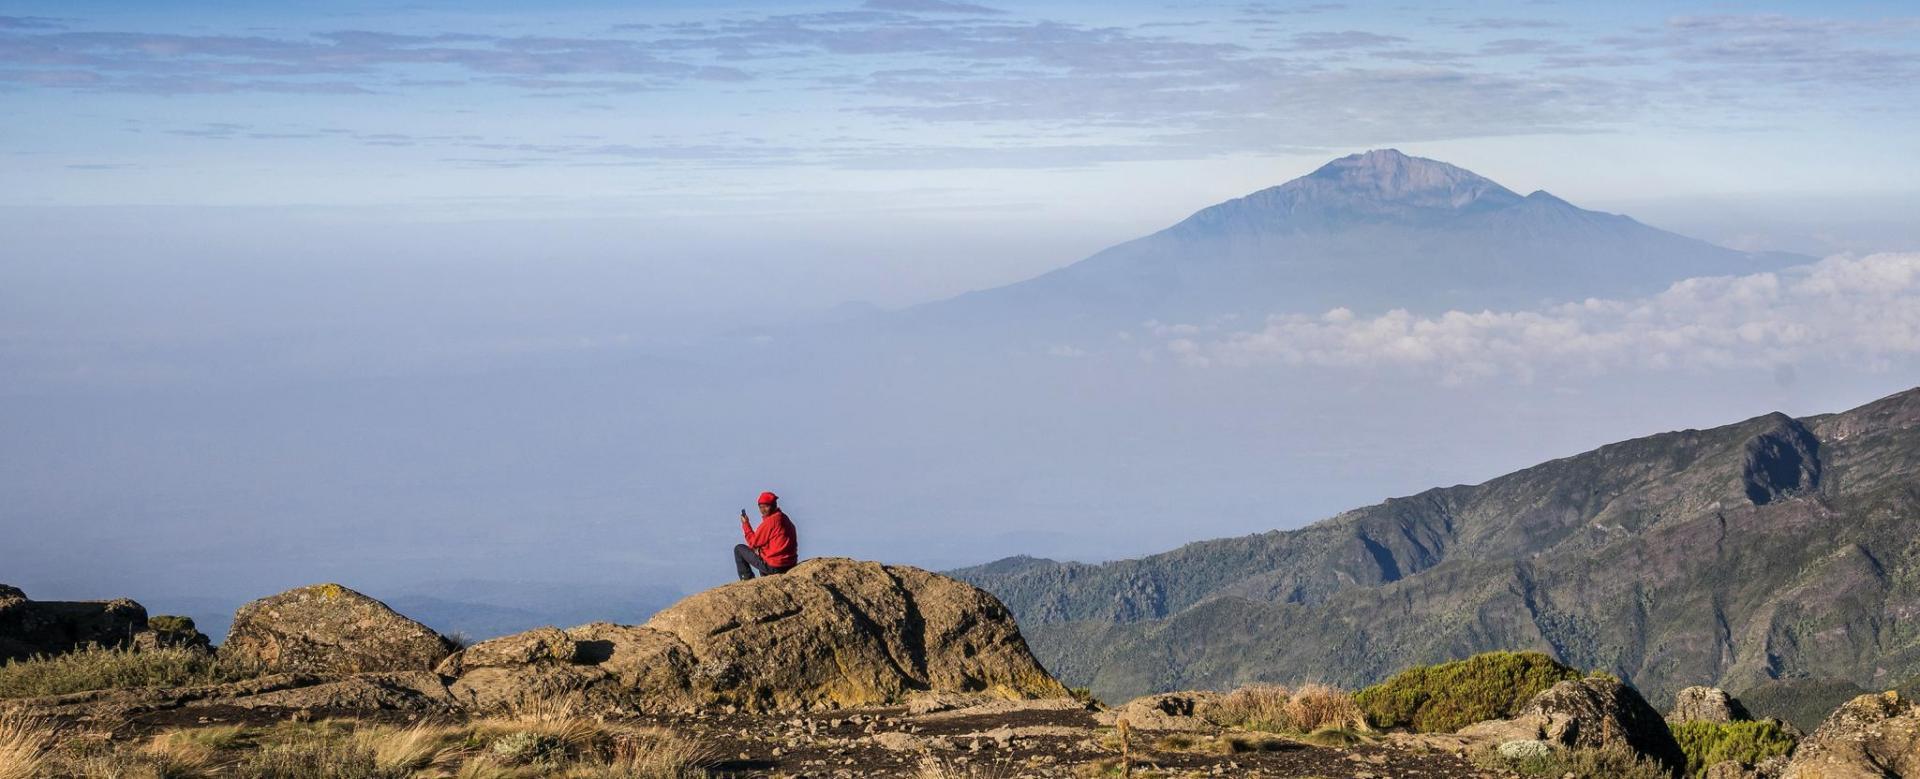 Voyage à pied Tanzanie : Du mont meru au kilimandjaro